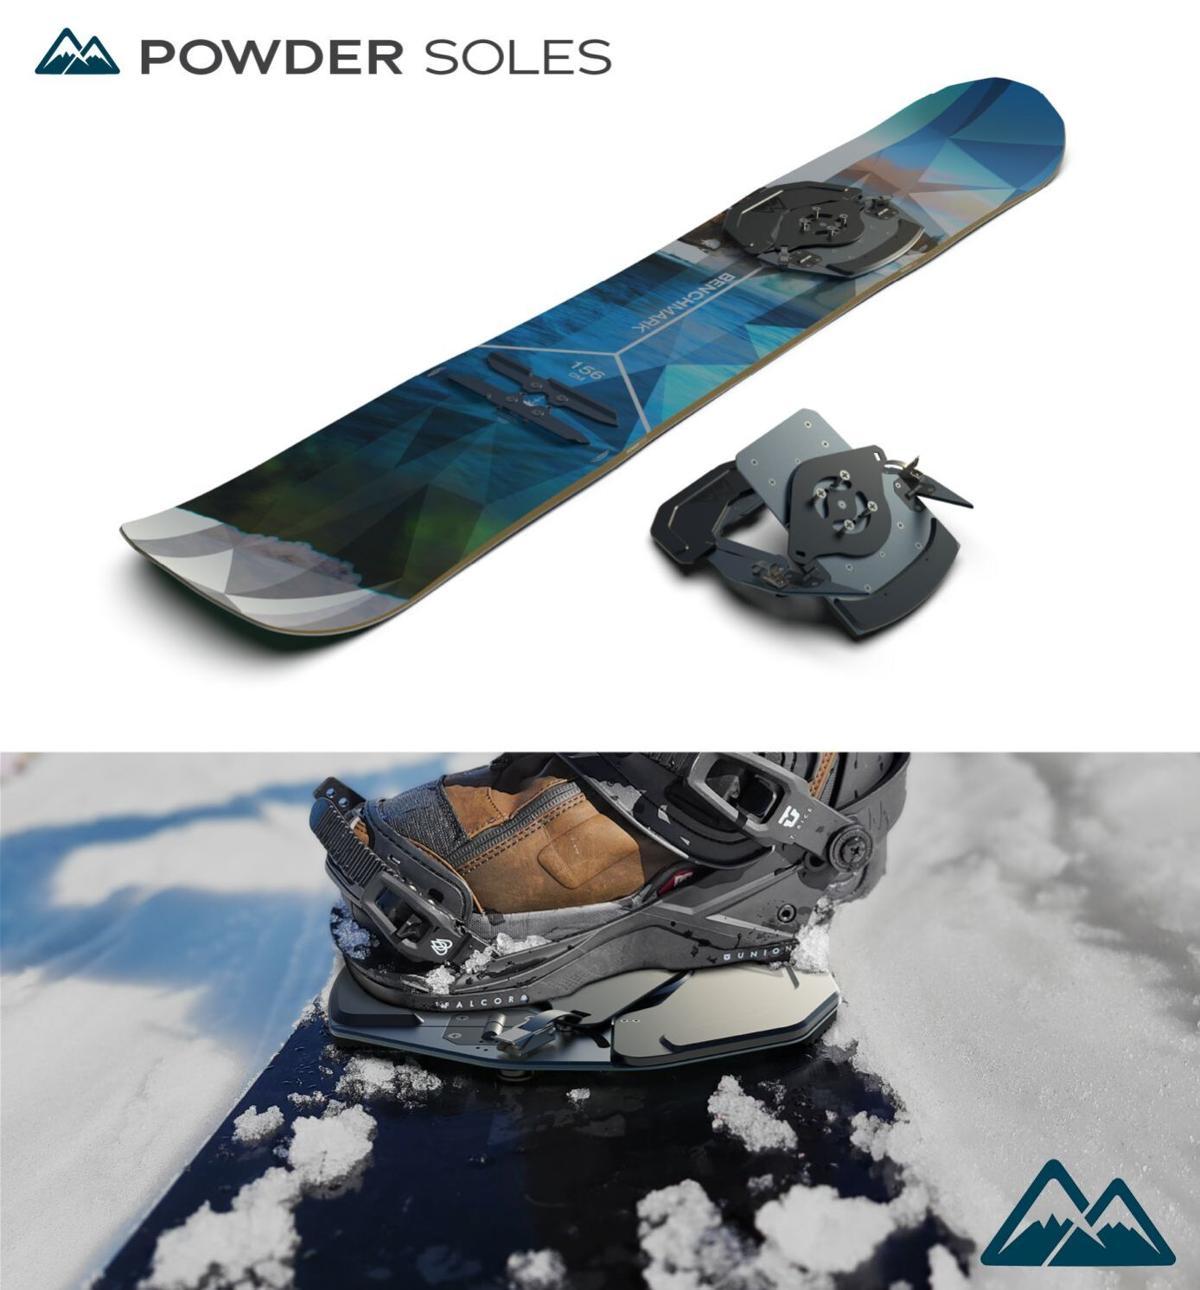 Powder Soles